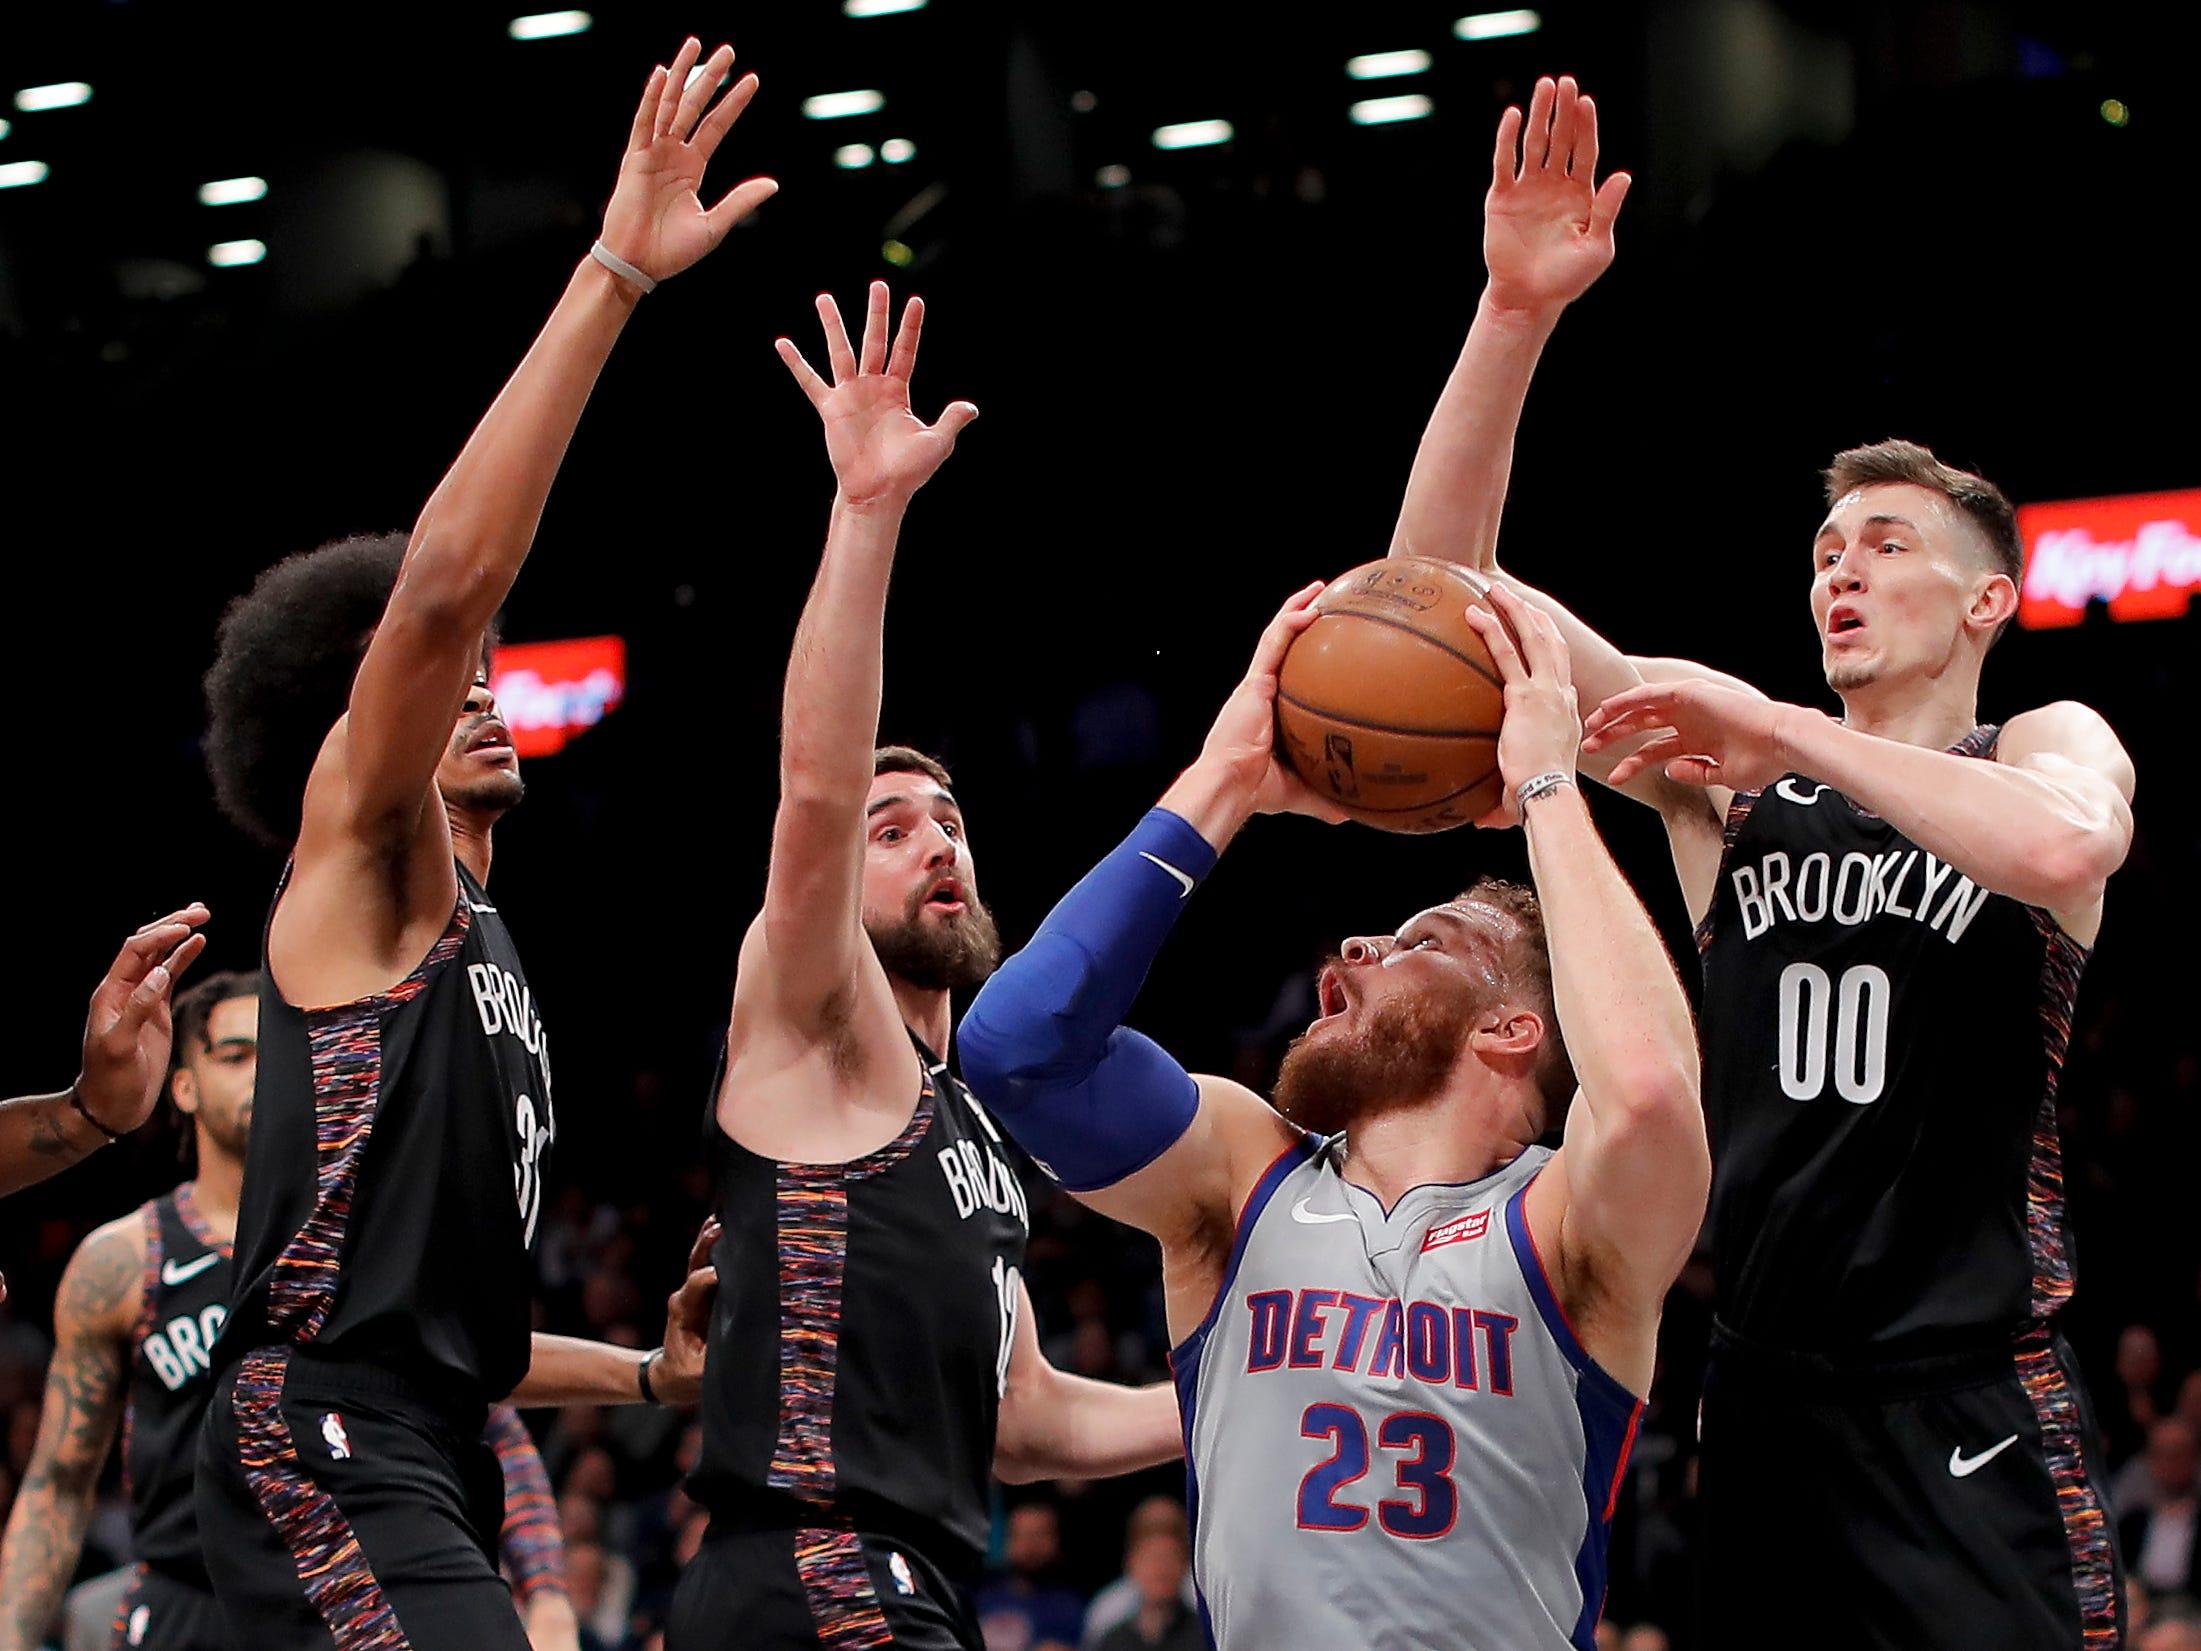 Detroit Pistons forward Blake Griffin (23) pump-fakes before shooting against Brooklyn Nets center Jarrett Allen (31), forward Joe Harris (12) and forward Rodions Kurucs (00) during the first quarter.